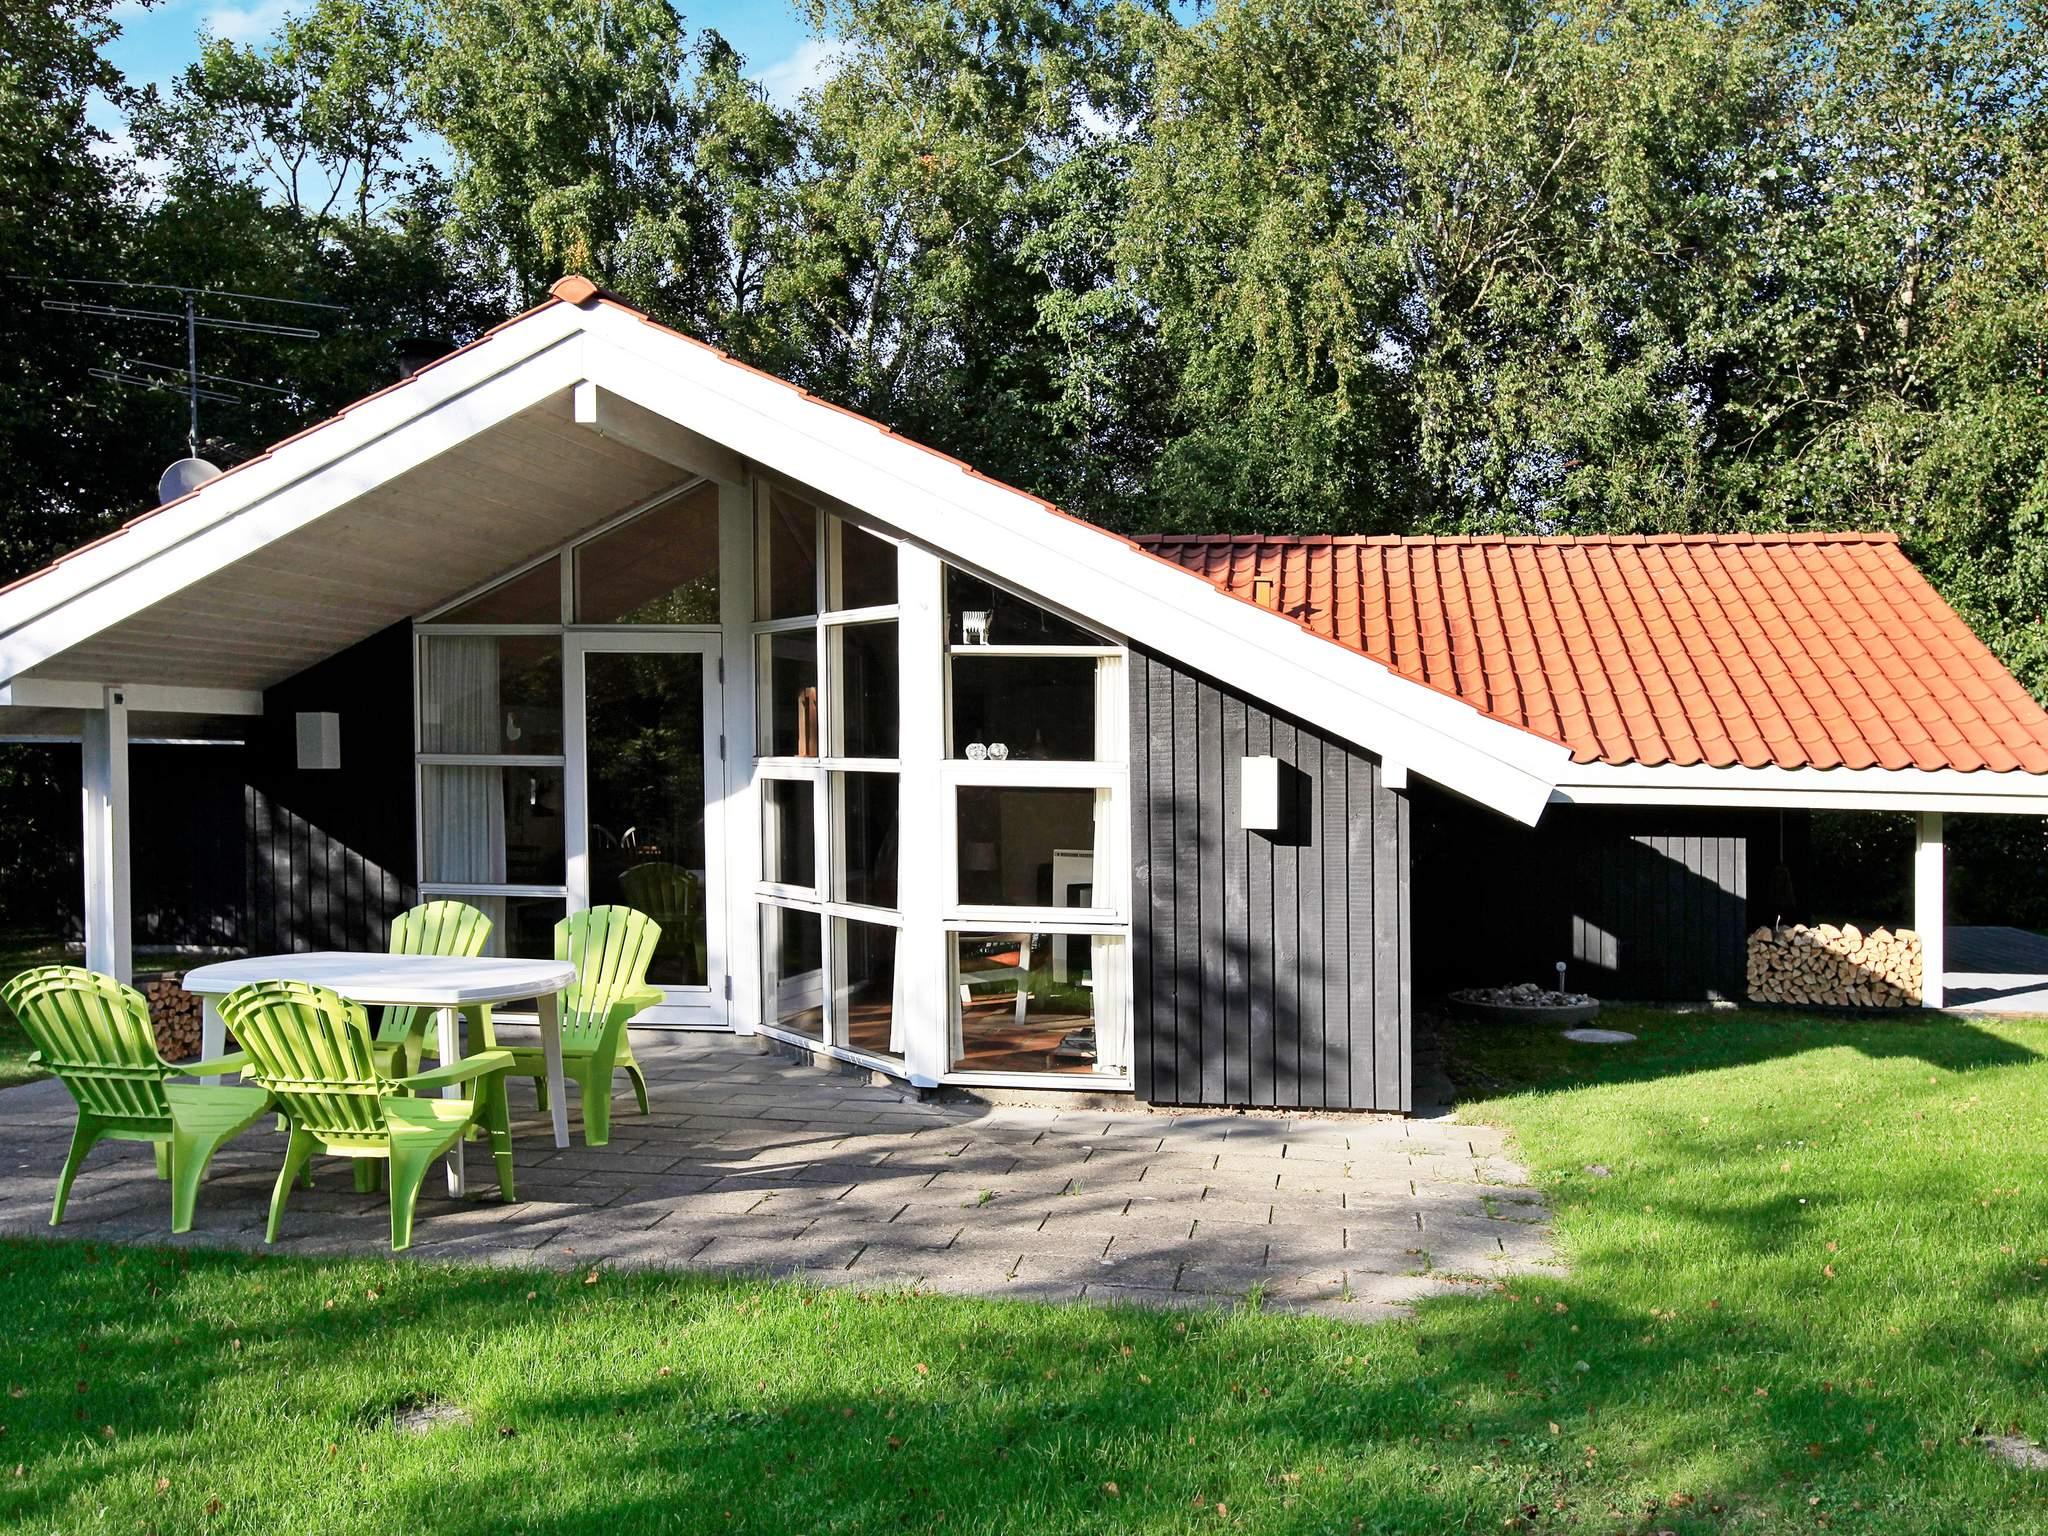 Ferienhaus Ristinge (160040), Ristinge, , Langeland, Dänemark, Bild 18